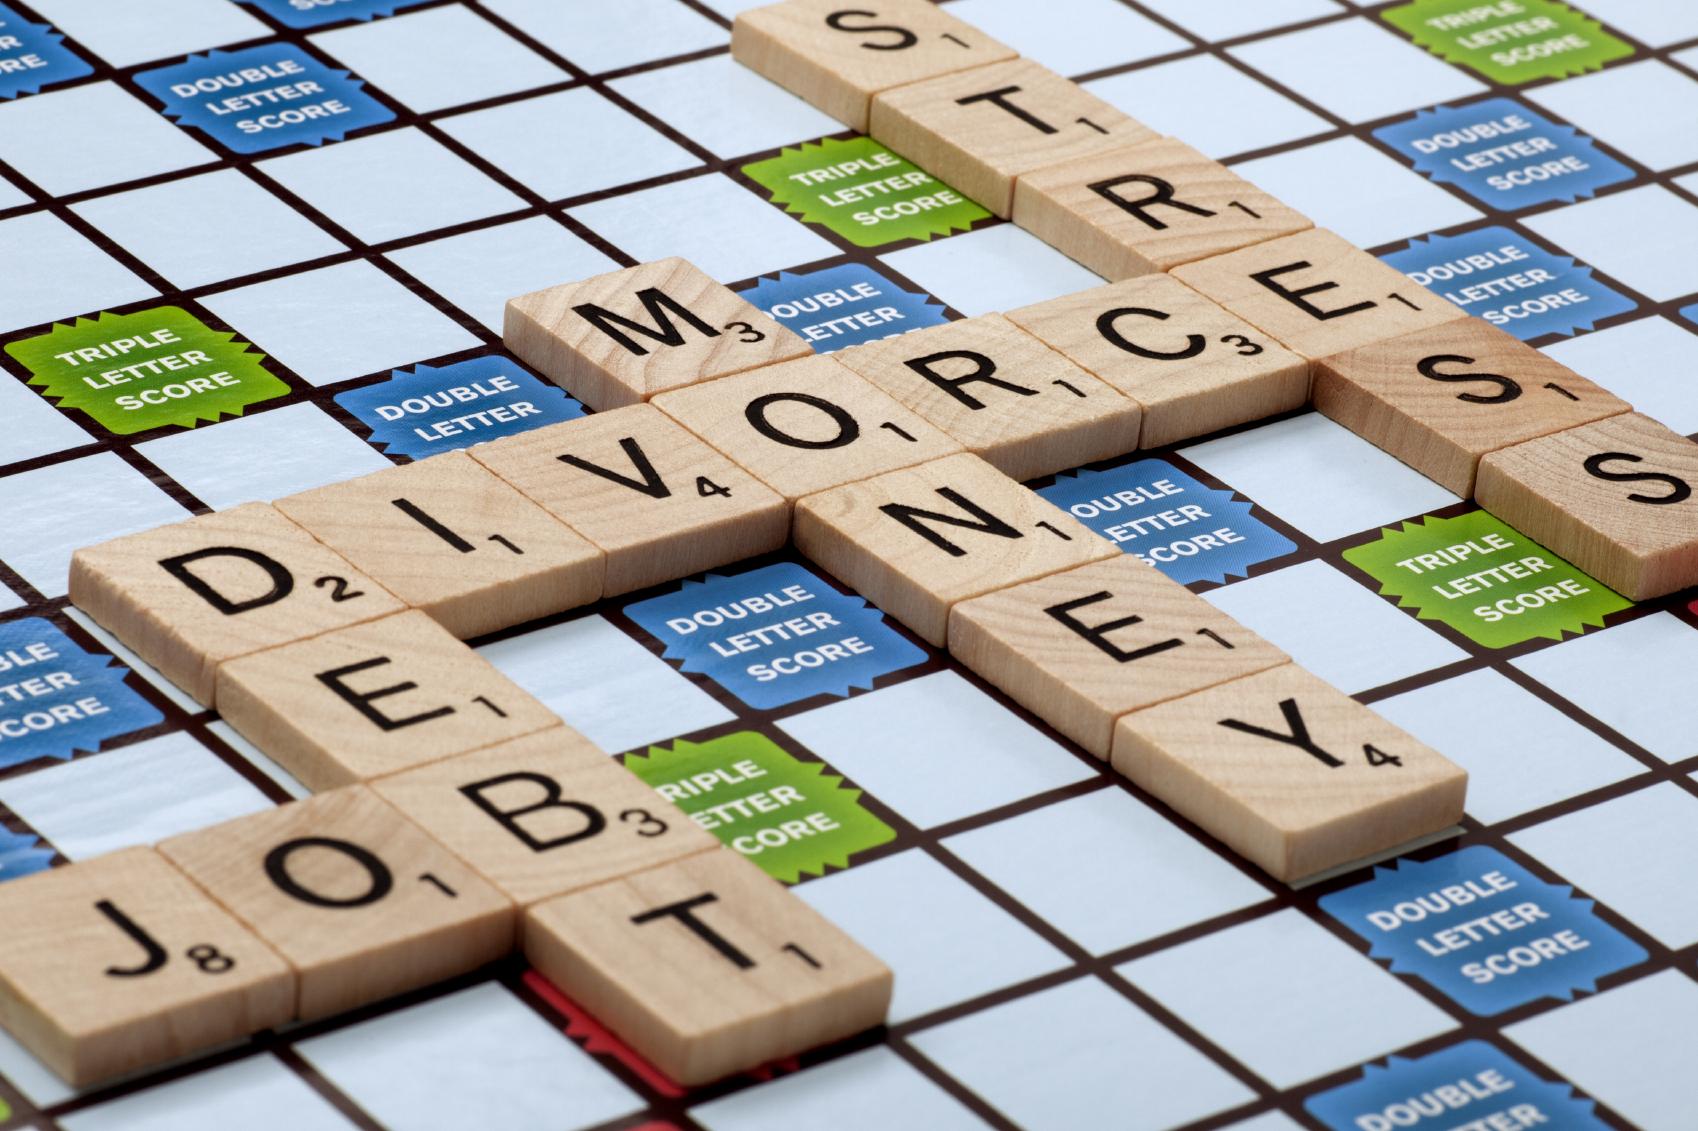 Divorce and Debt Scrabble Picture